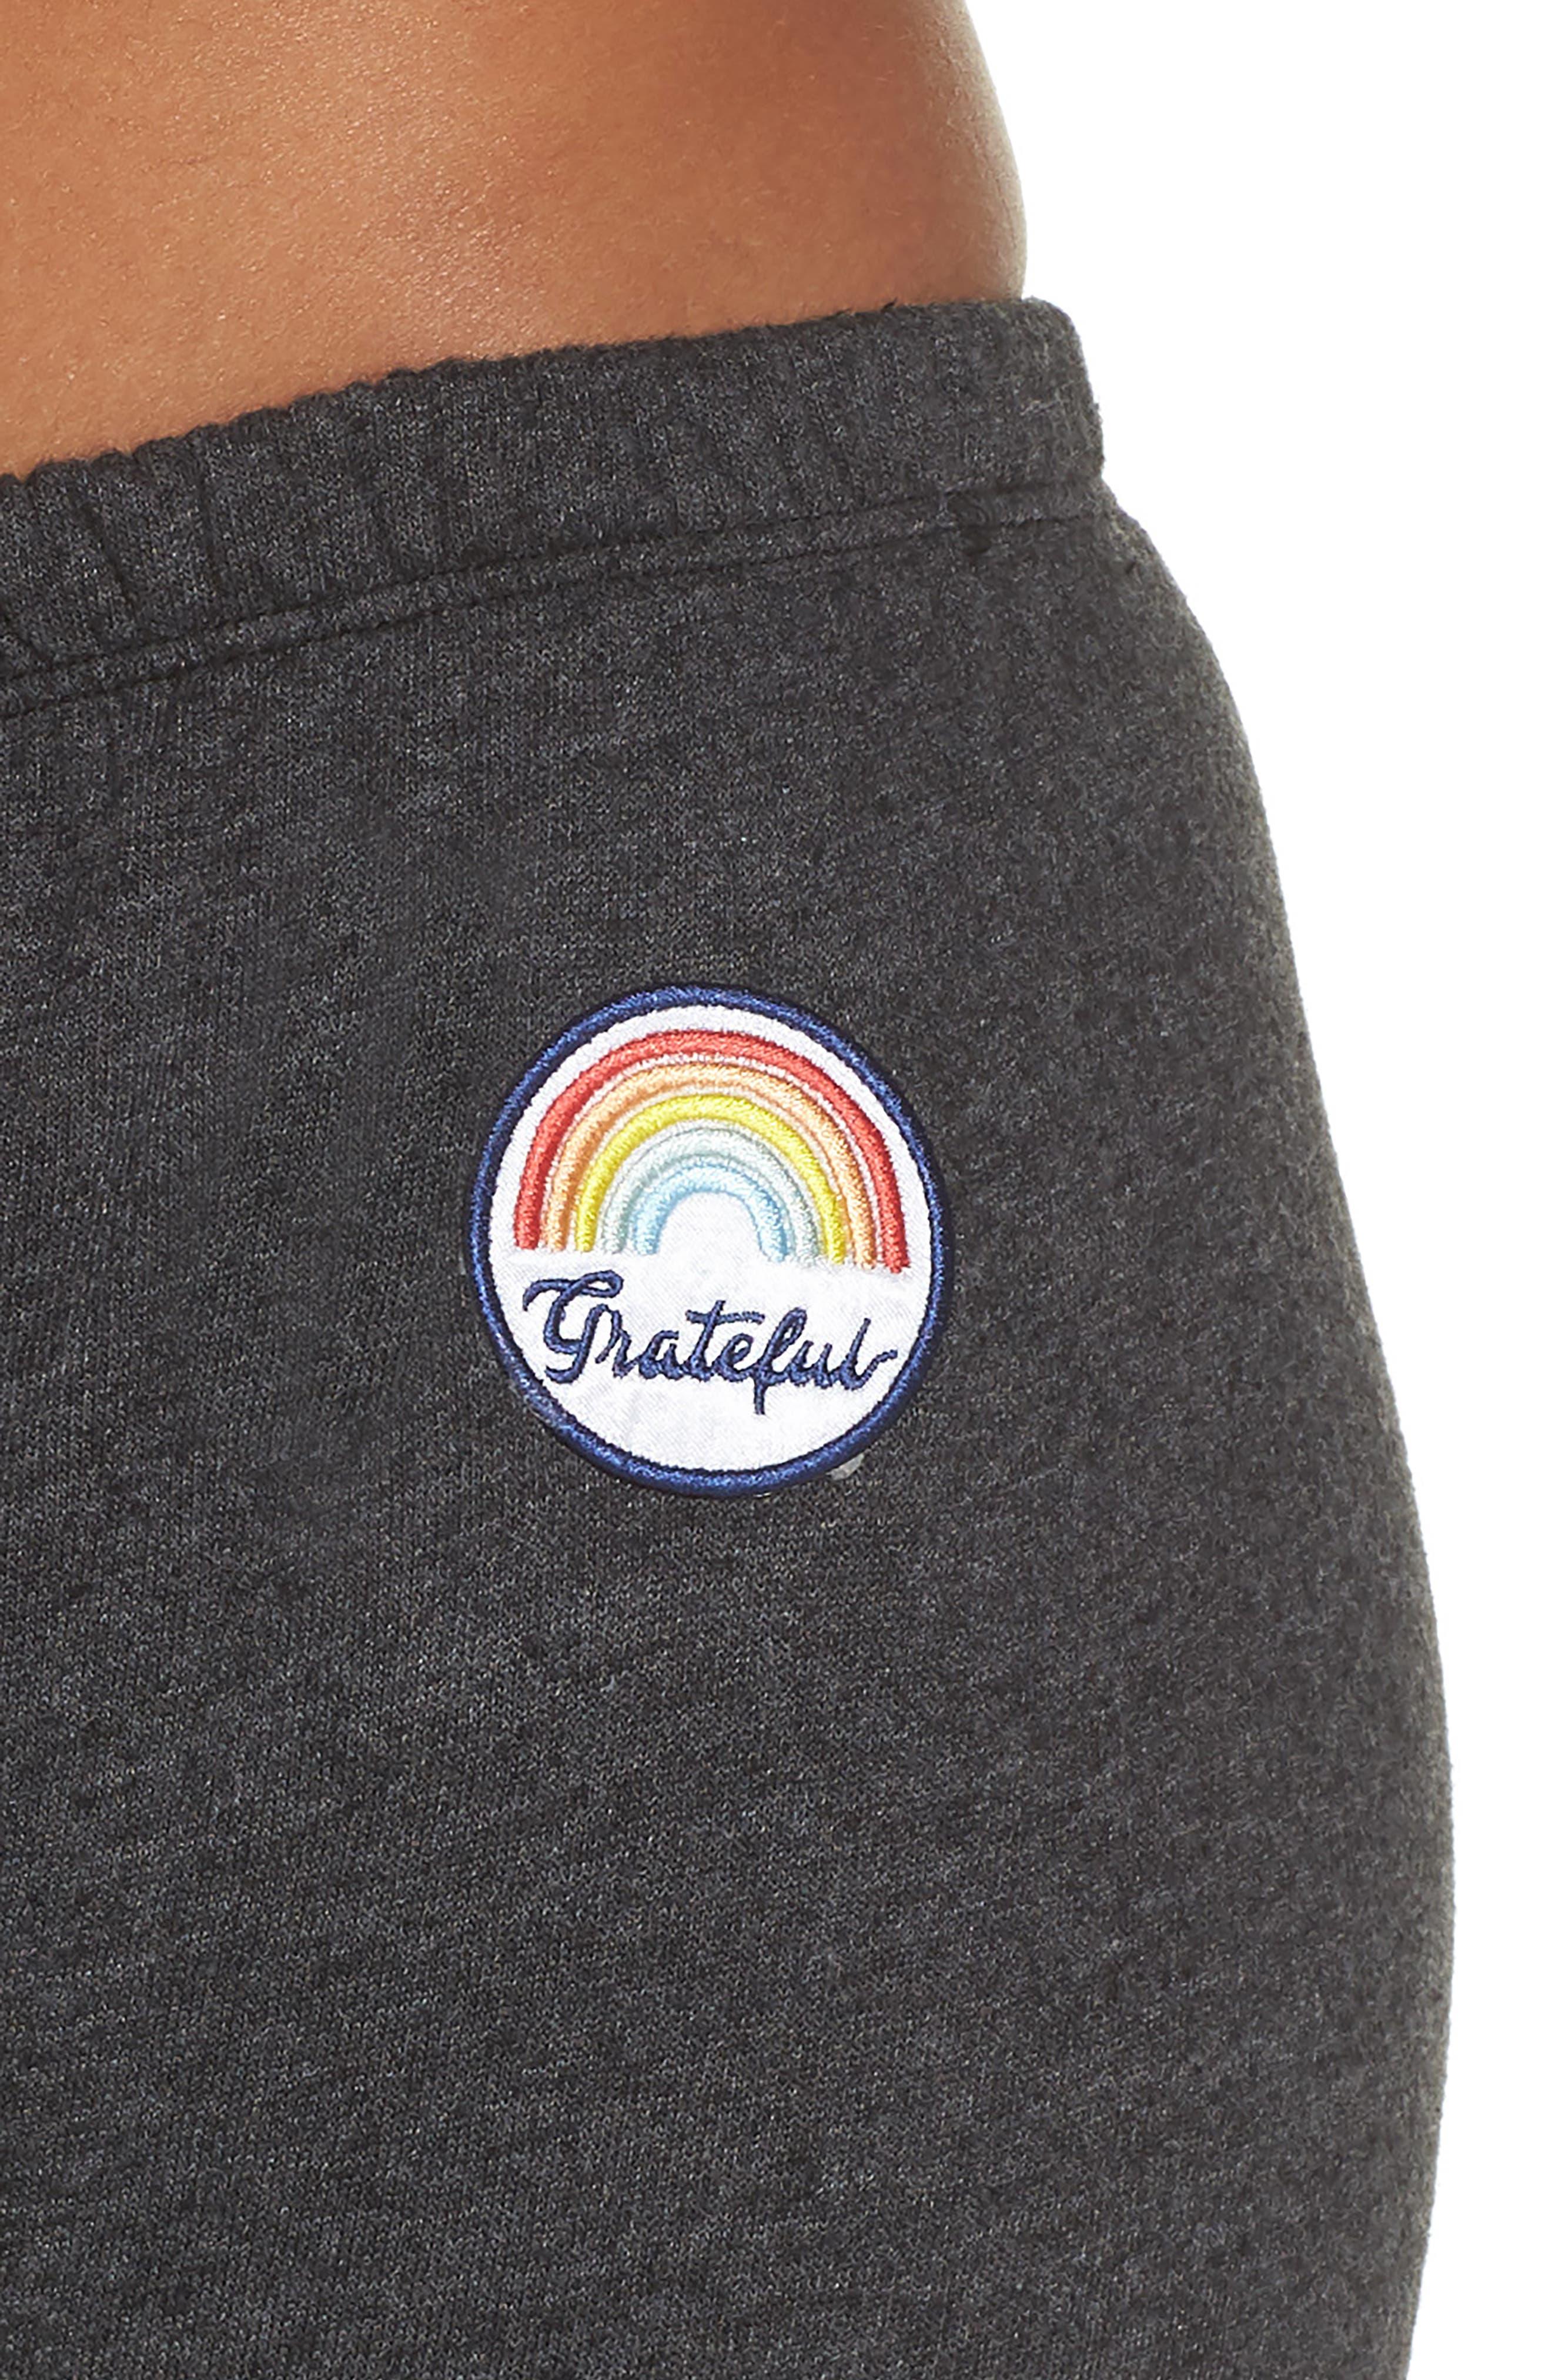 Grateful Perfect Knit Pants,                             Alternate thumbnail 4, color,                             Vntg Black